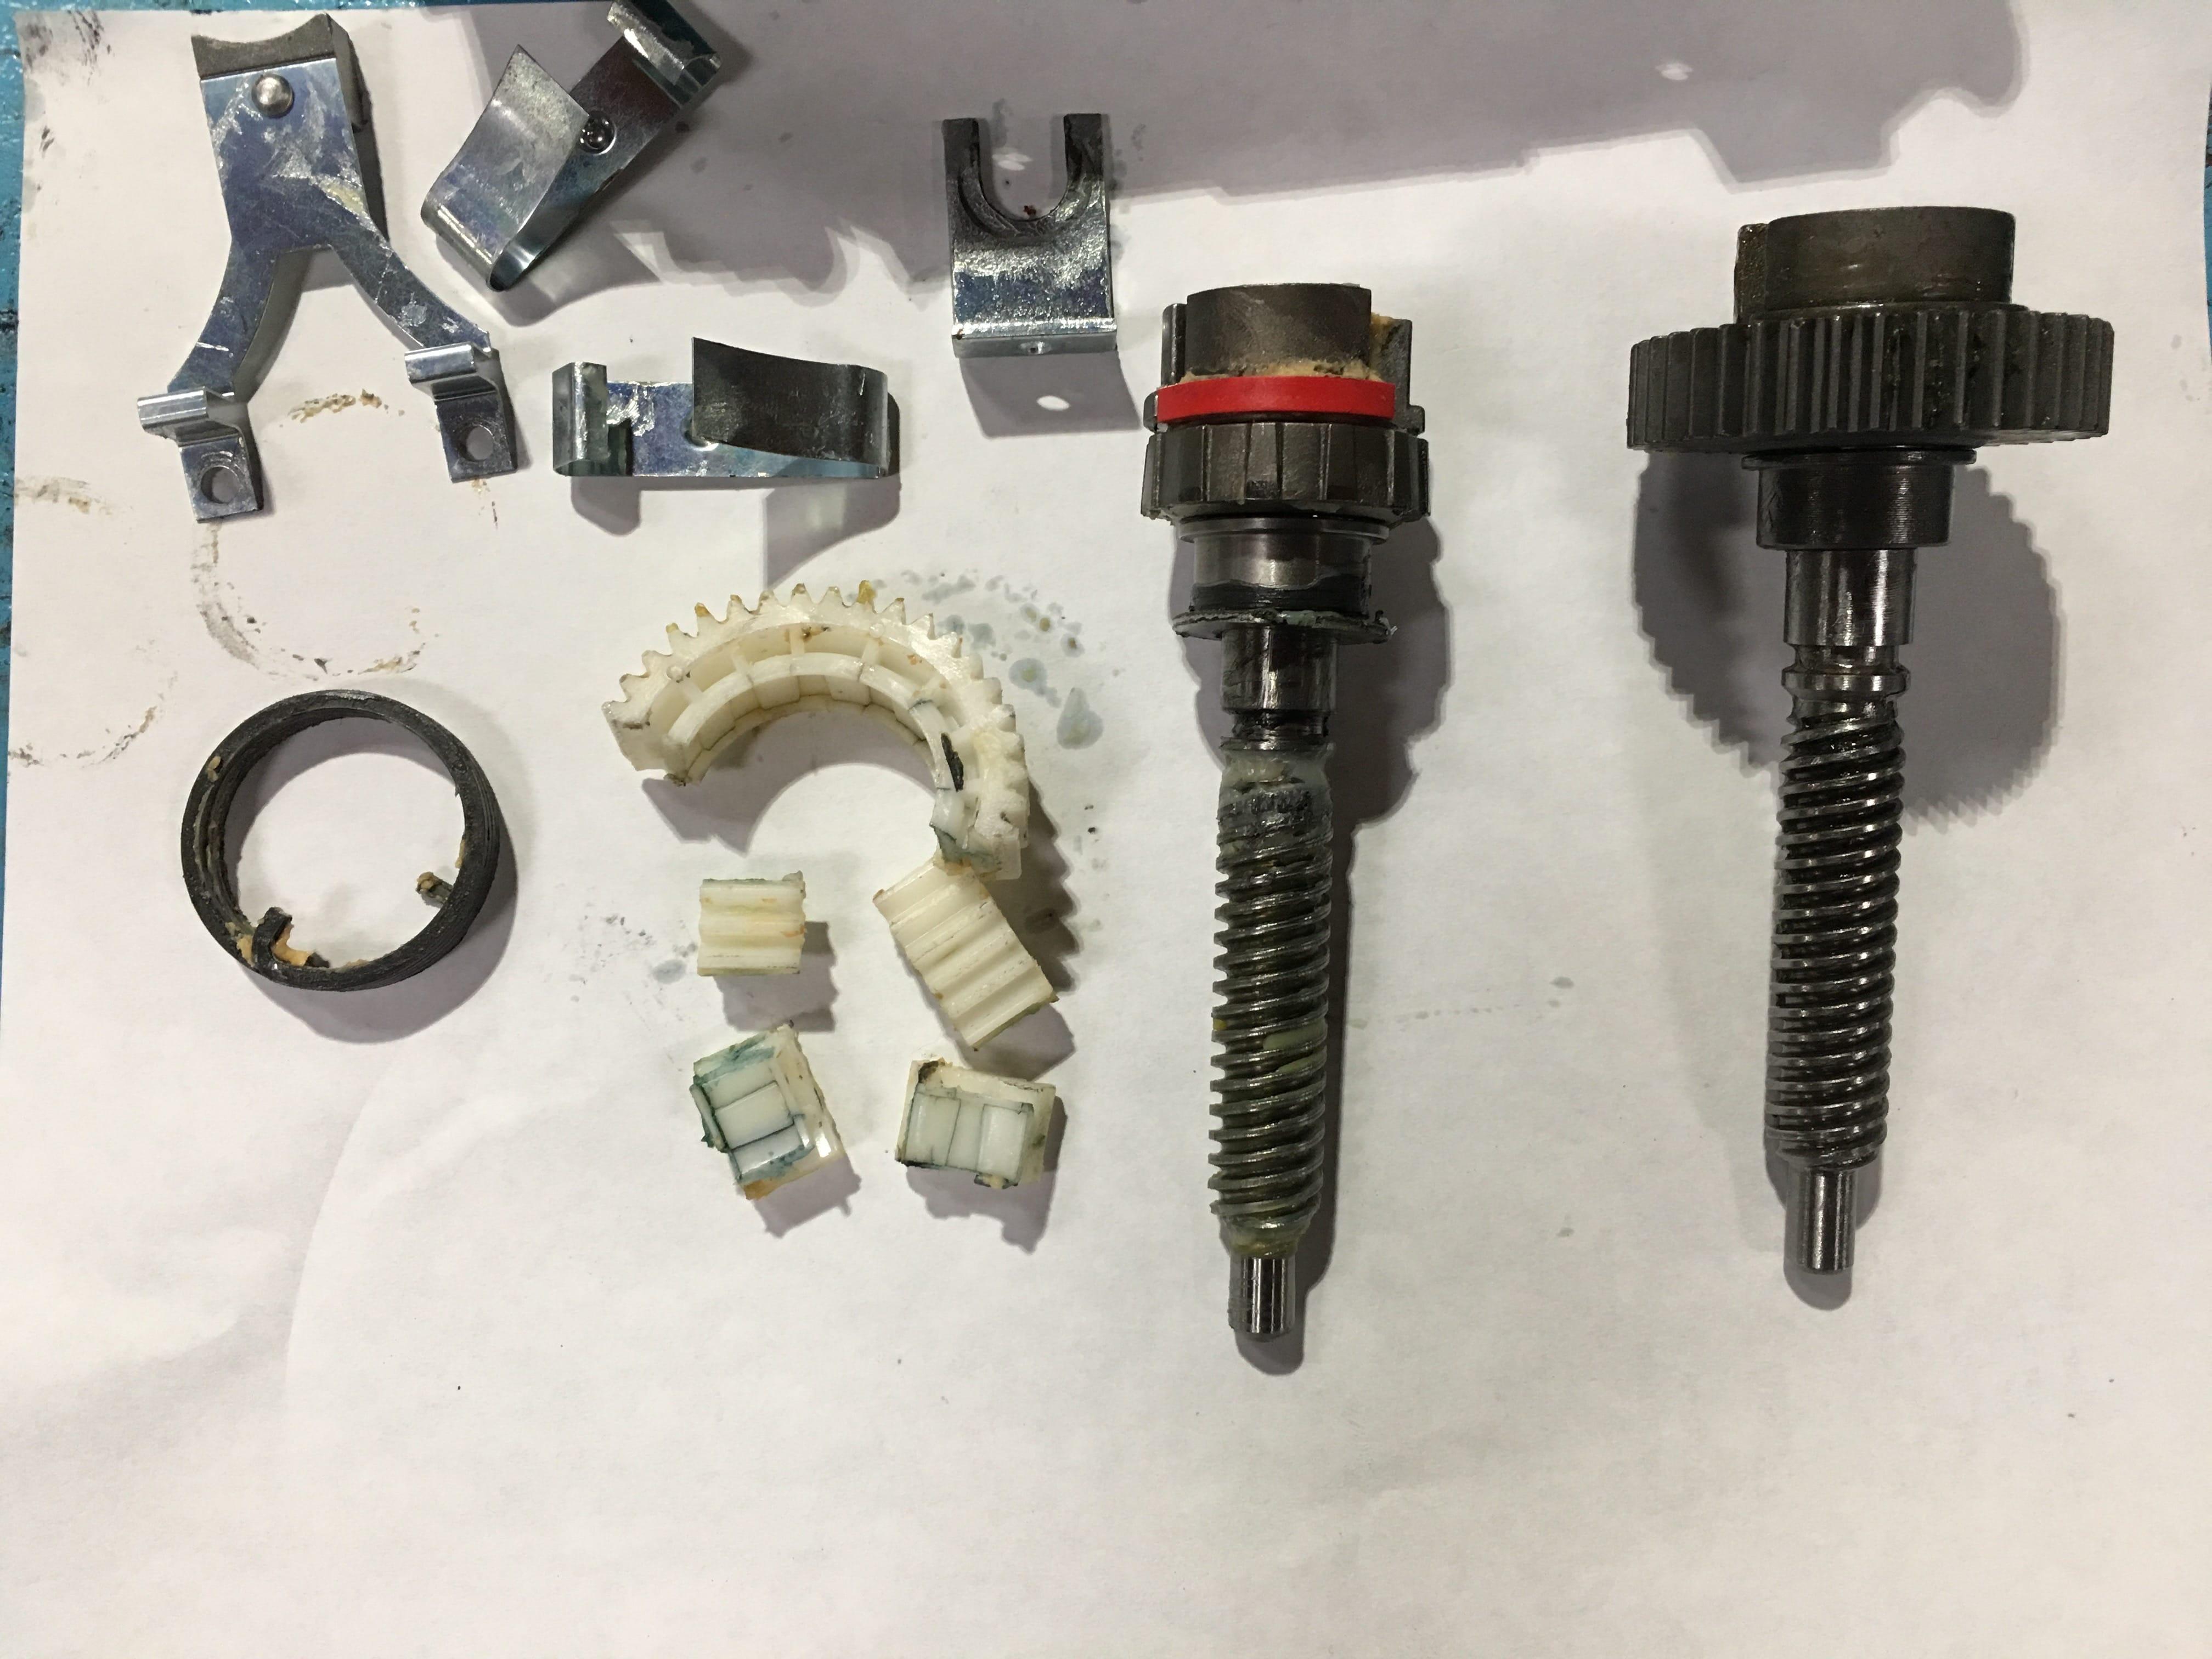 How to fix E65 E66 BMW 7 Series Parking Brake Actuator